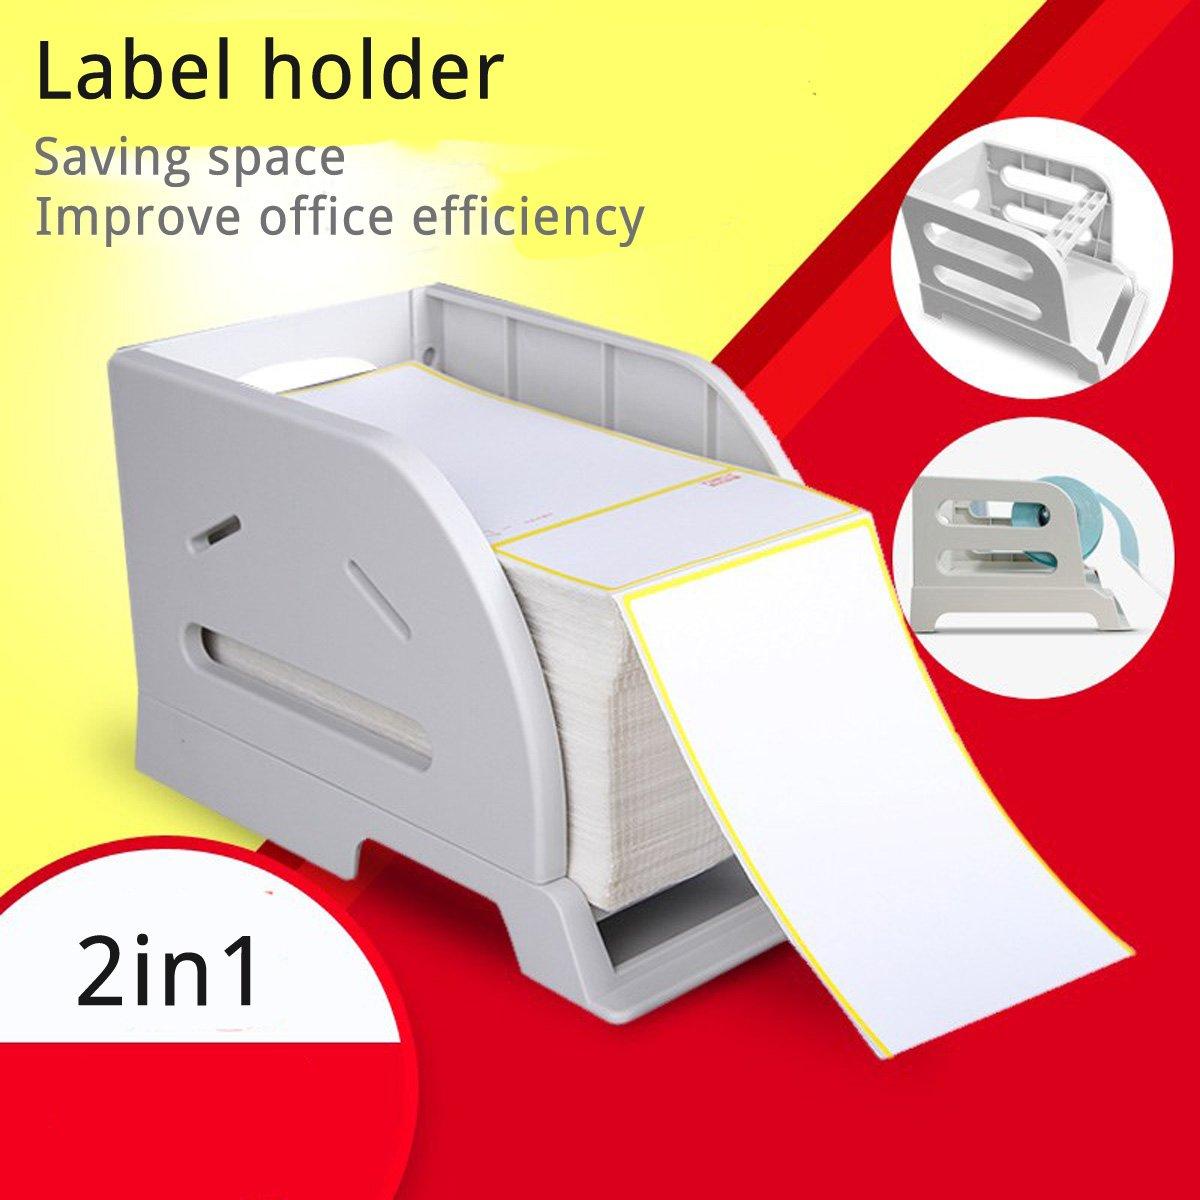 Label Holder for Rolls and Fan-Fold Labels bracket Plastic Label Paper Holder of Thermal Bar code Sticker Label Printer for Delivery, Supermarket, Pharmacy Store (2in1 Holder B)